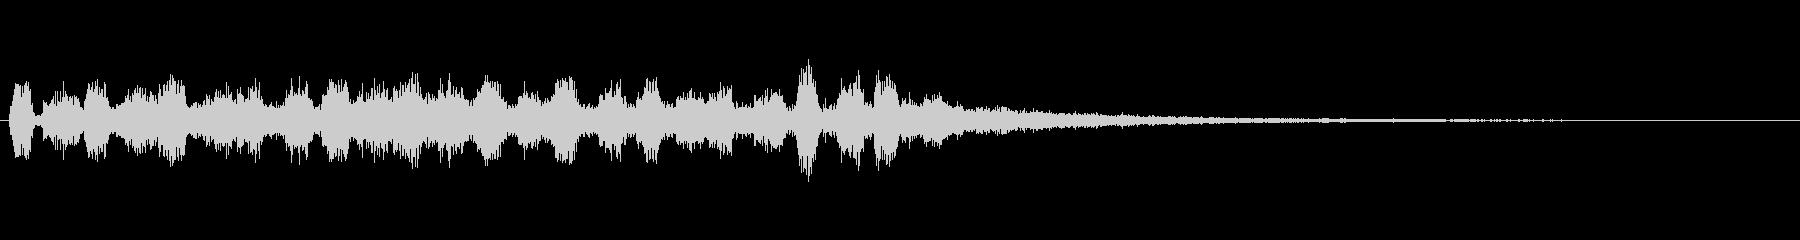 【SE 効果音】ピロピロ2の未再生の波形